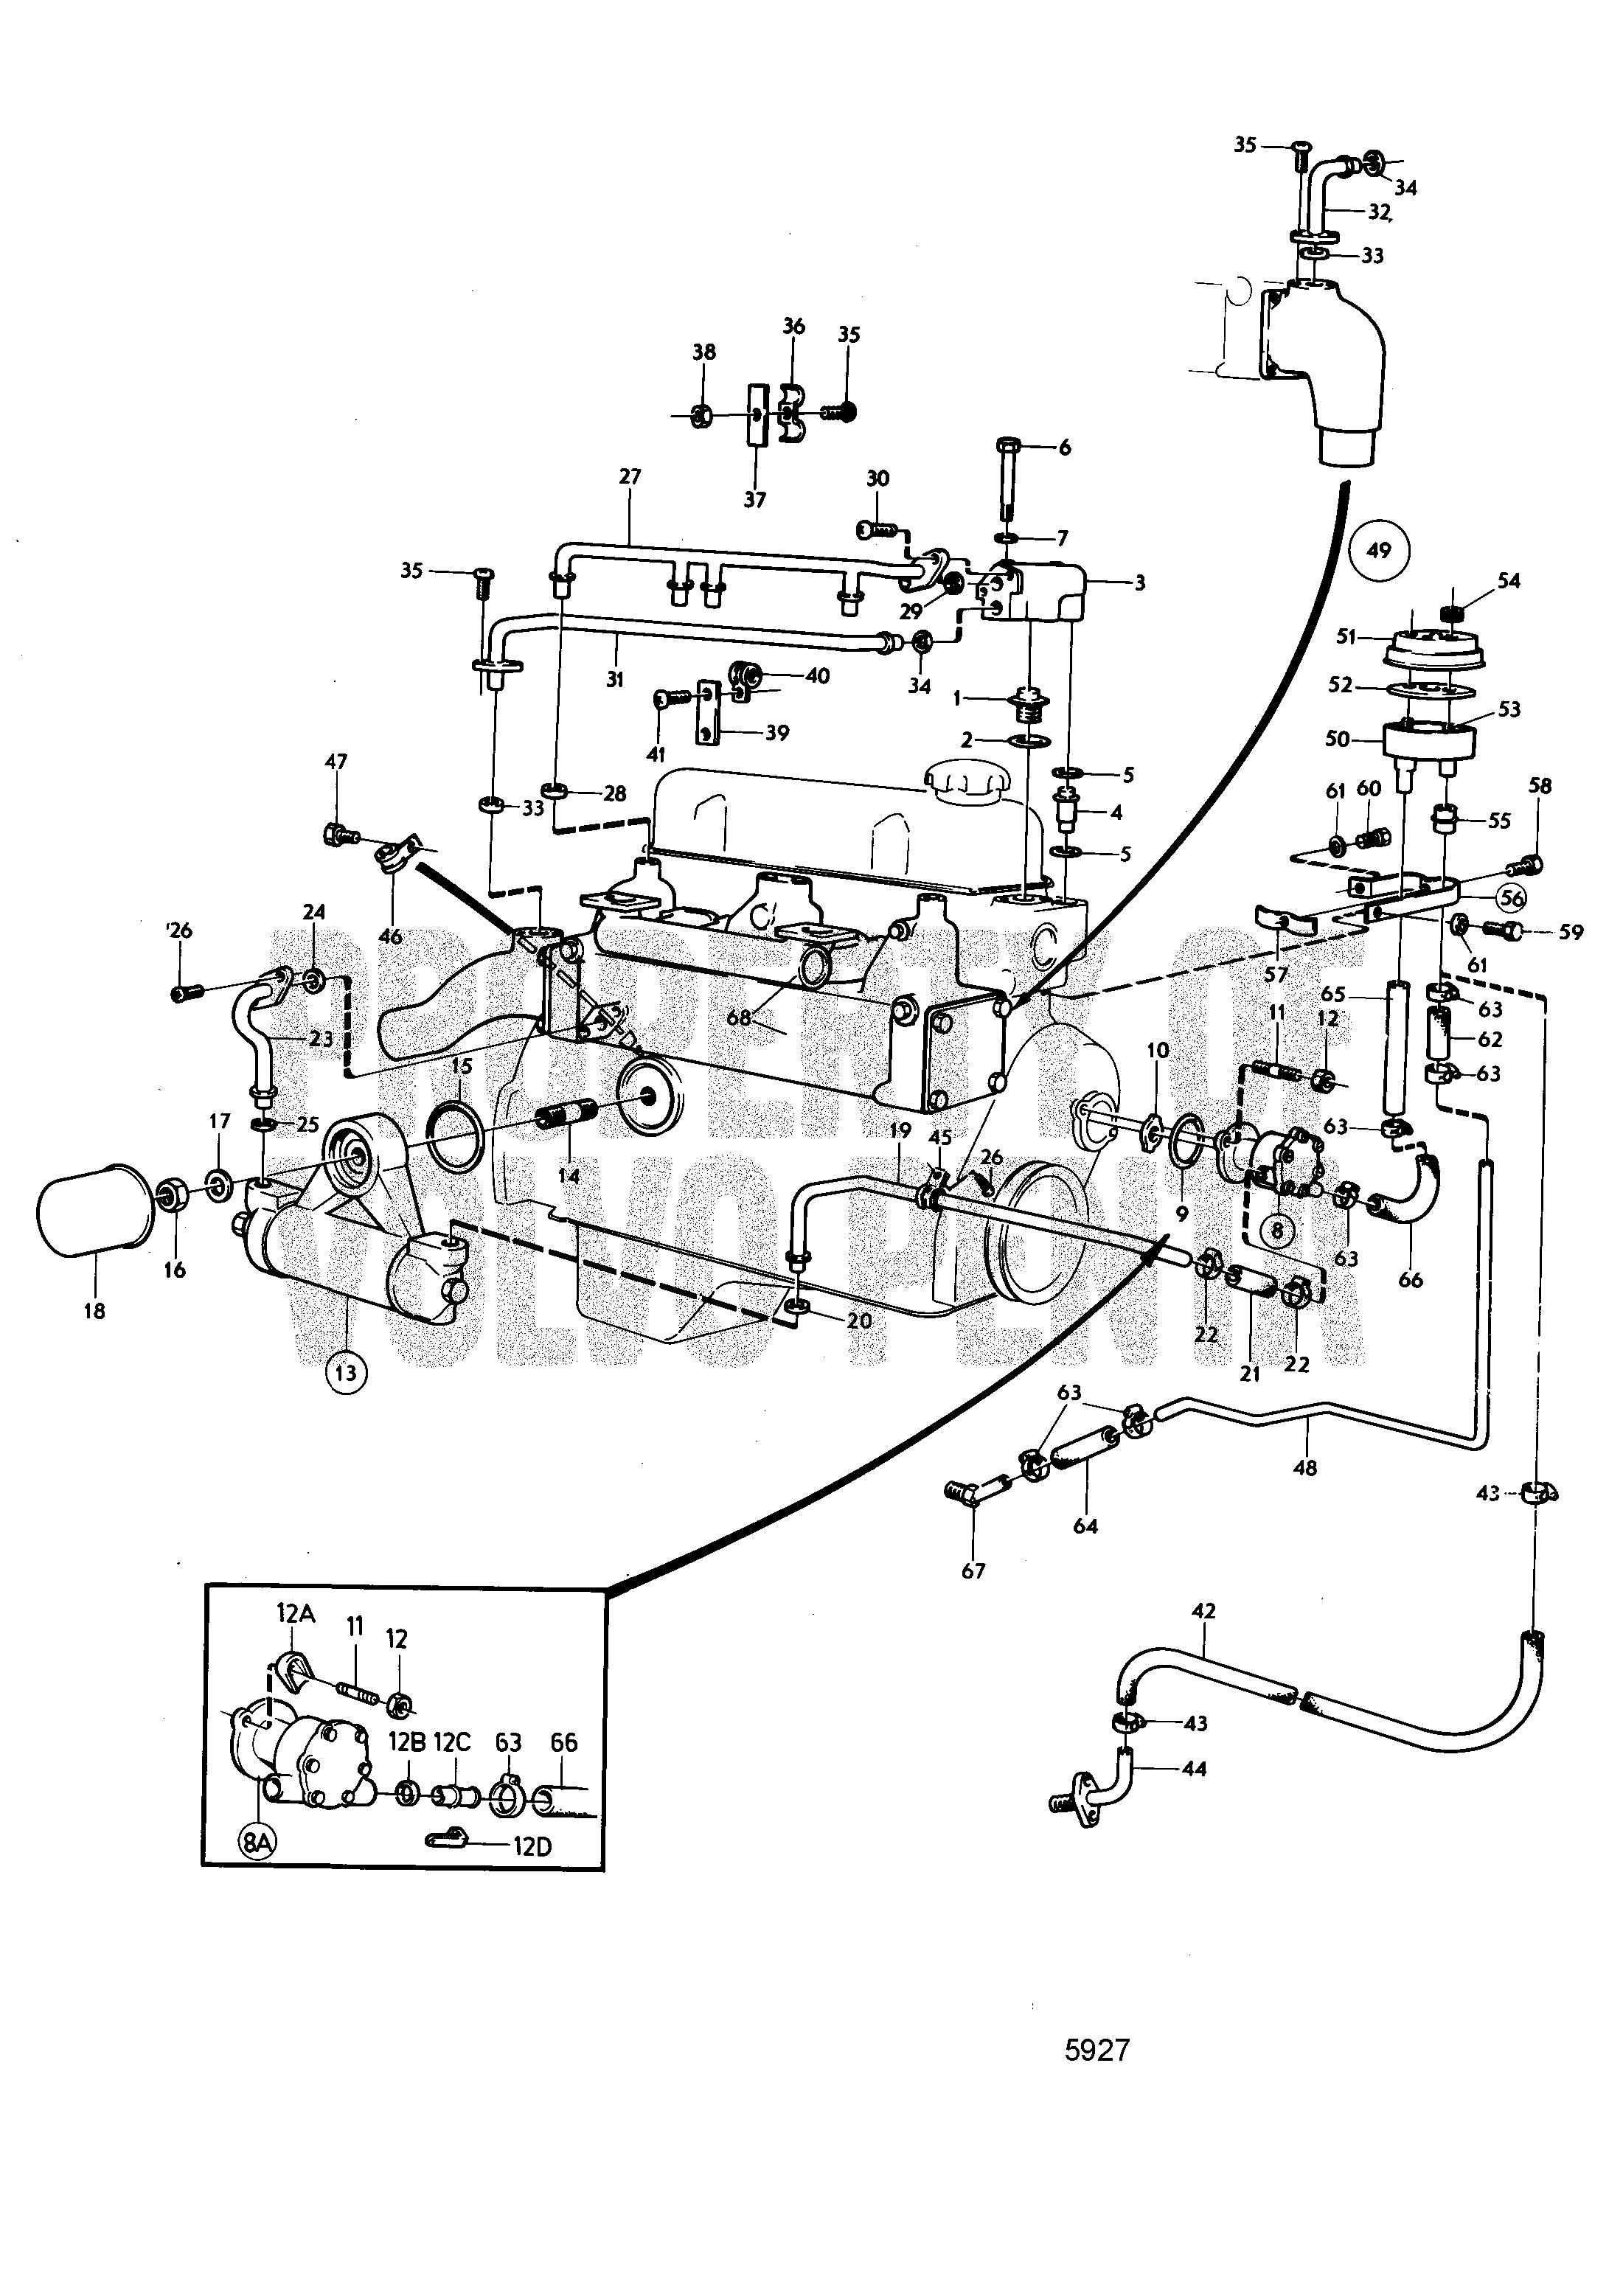 volvo marine gasoline engines aq115a aq115b aq130 aq130a rh vansoutboardparts com Kohler 17.5 HP Engine Manual Tecumseh Engine Manual